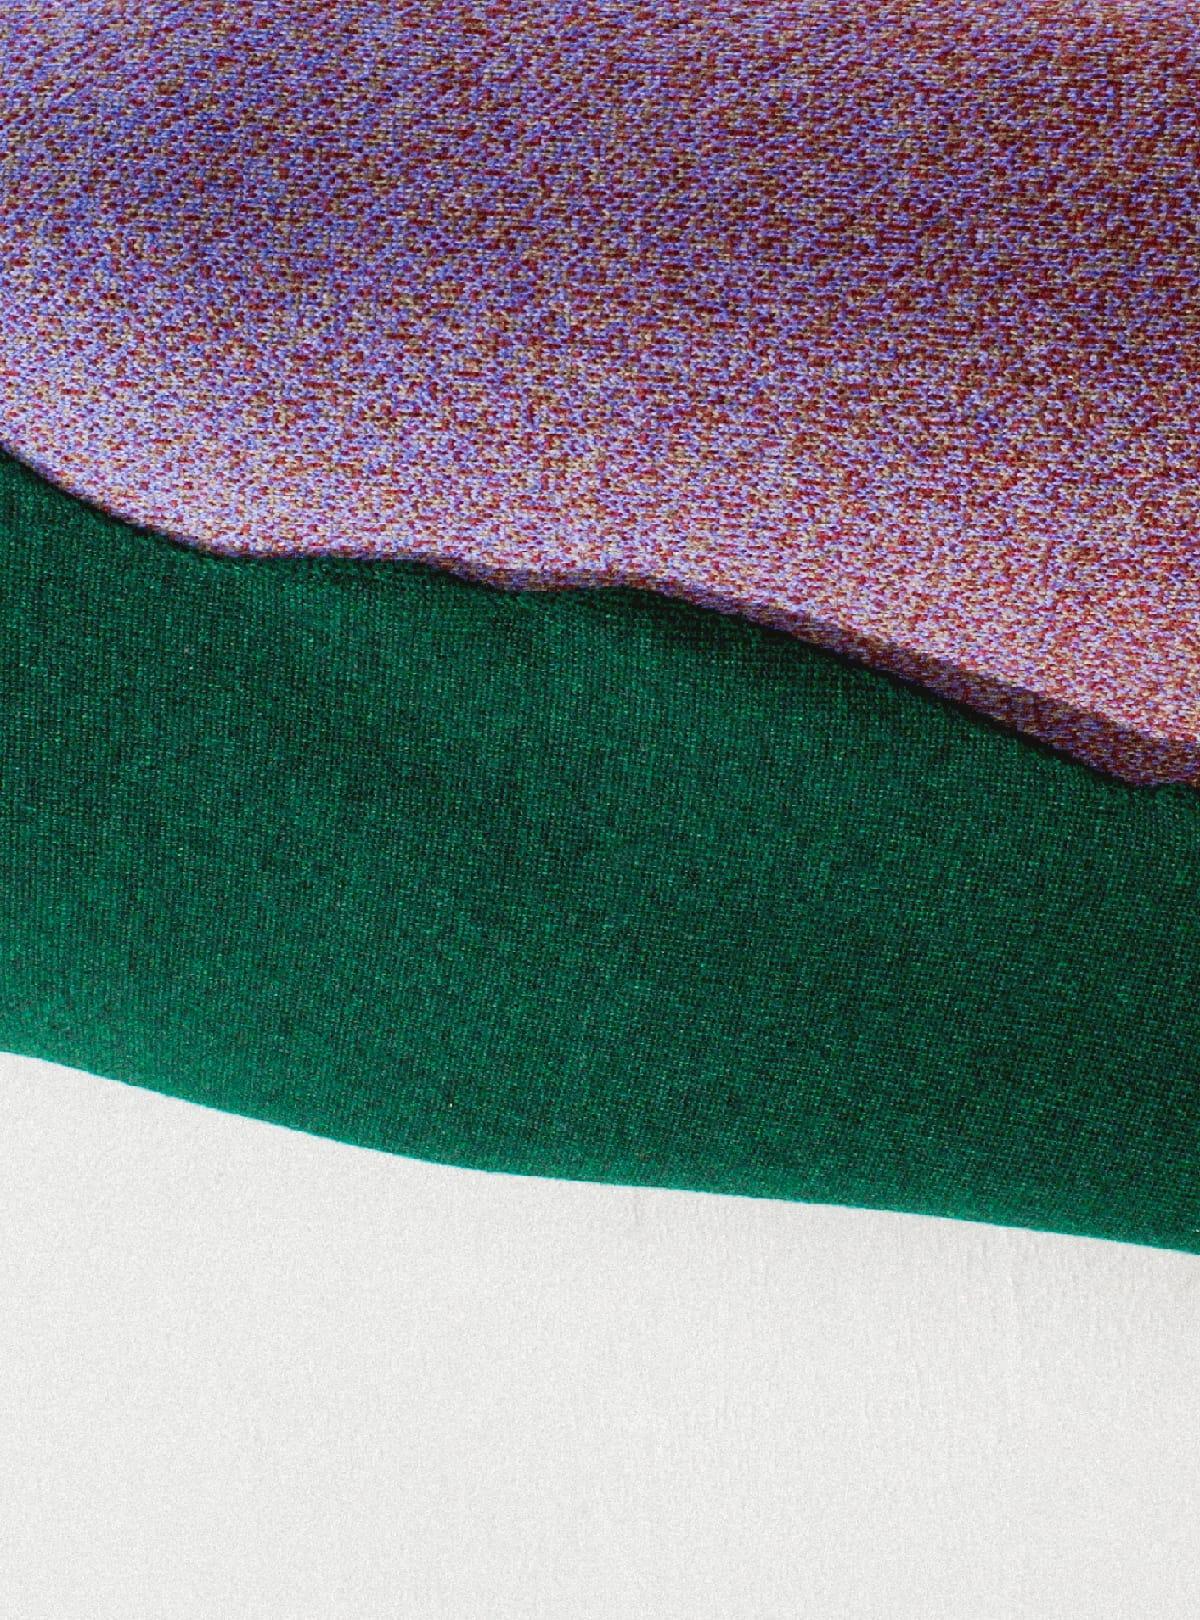 Shoot knitted apparel 3 skirt detail